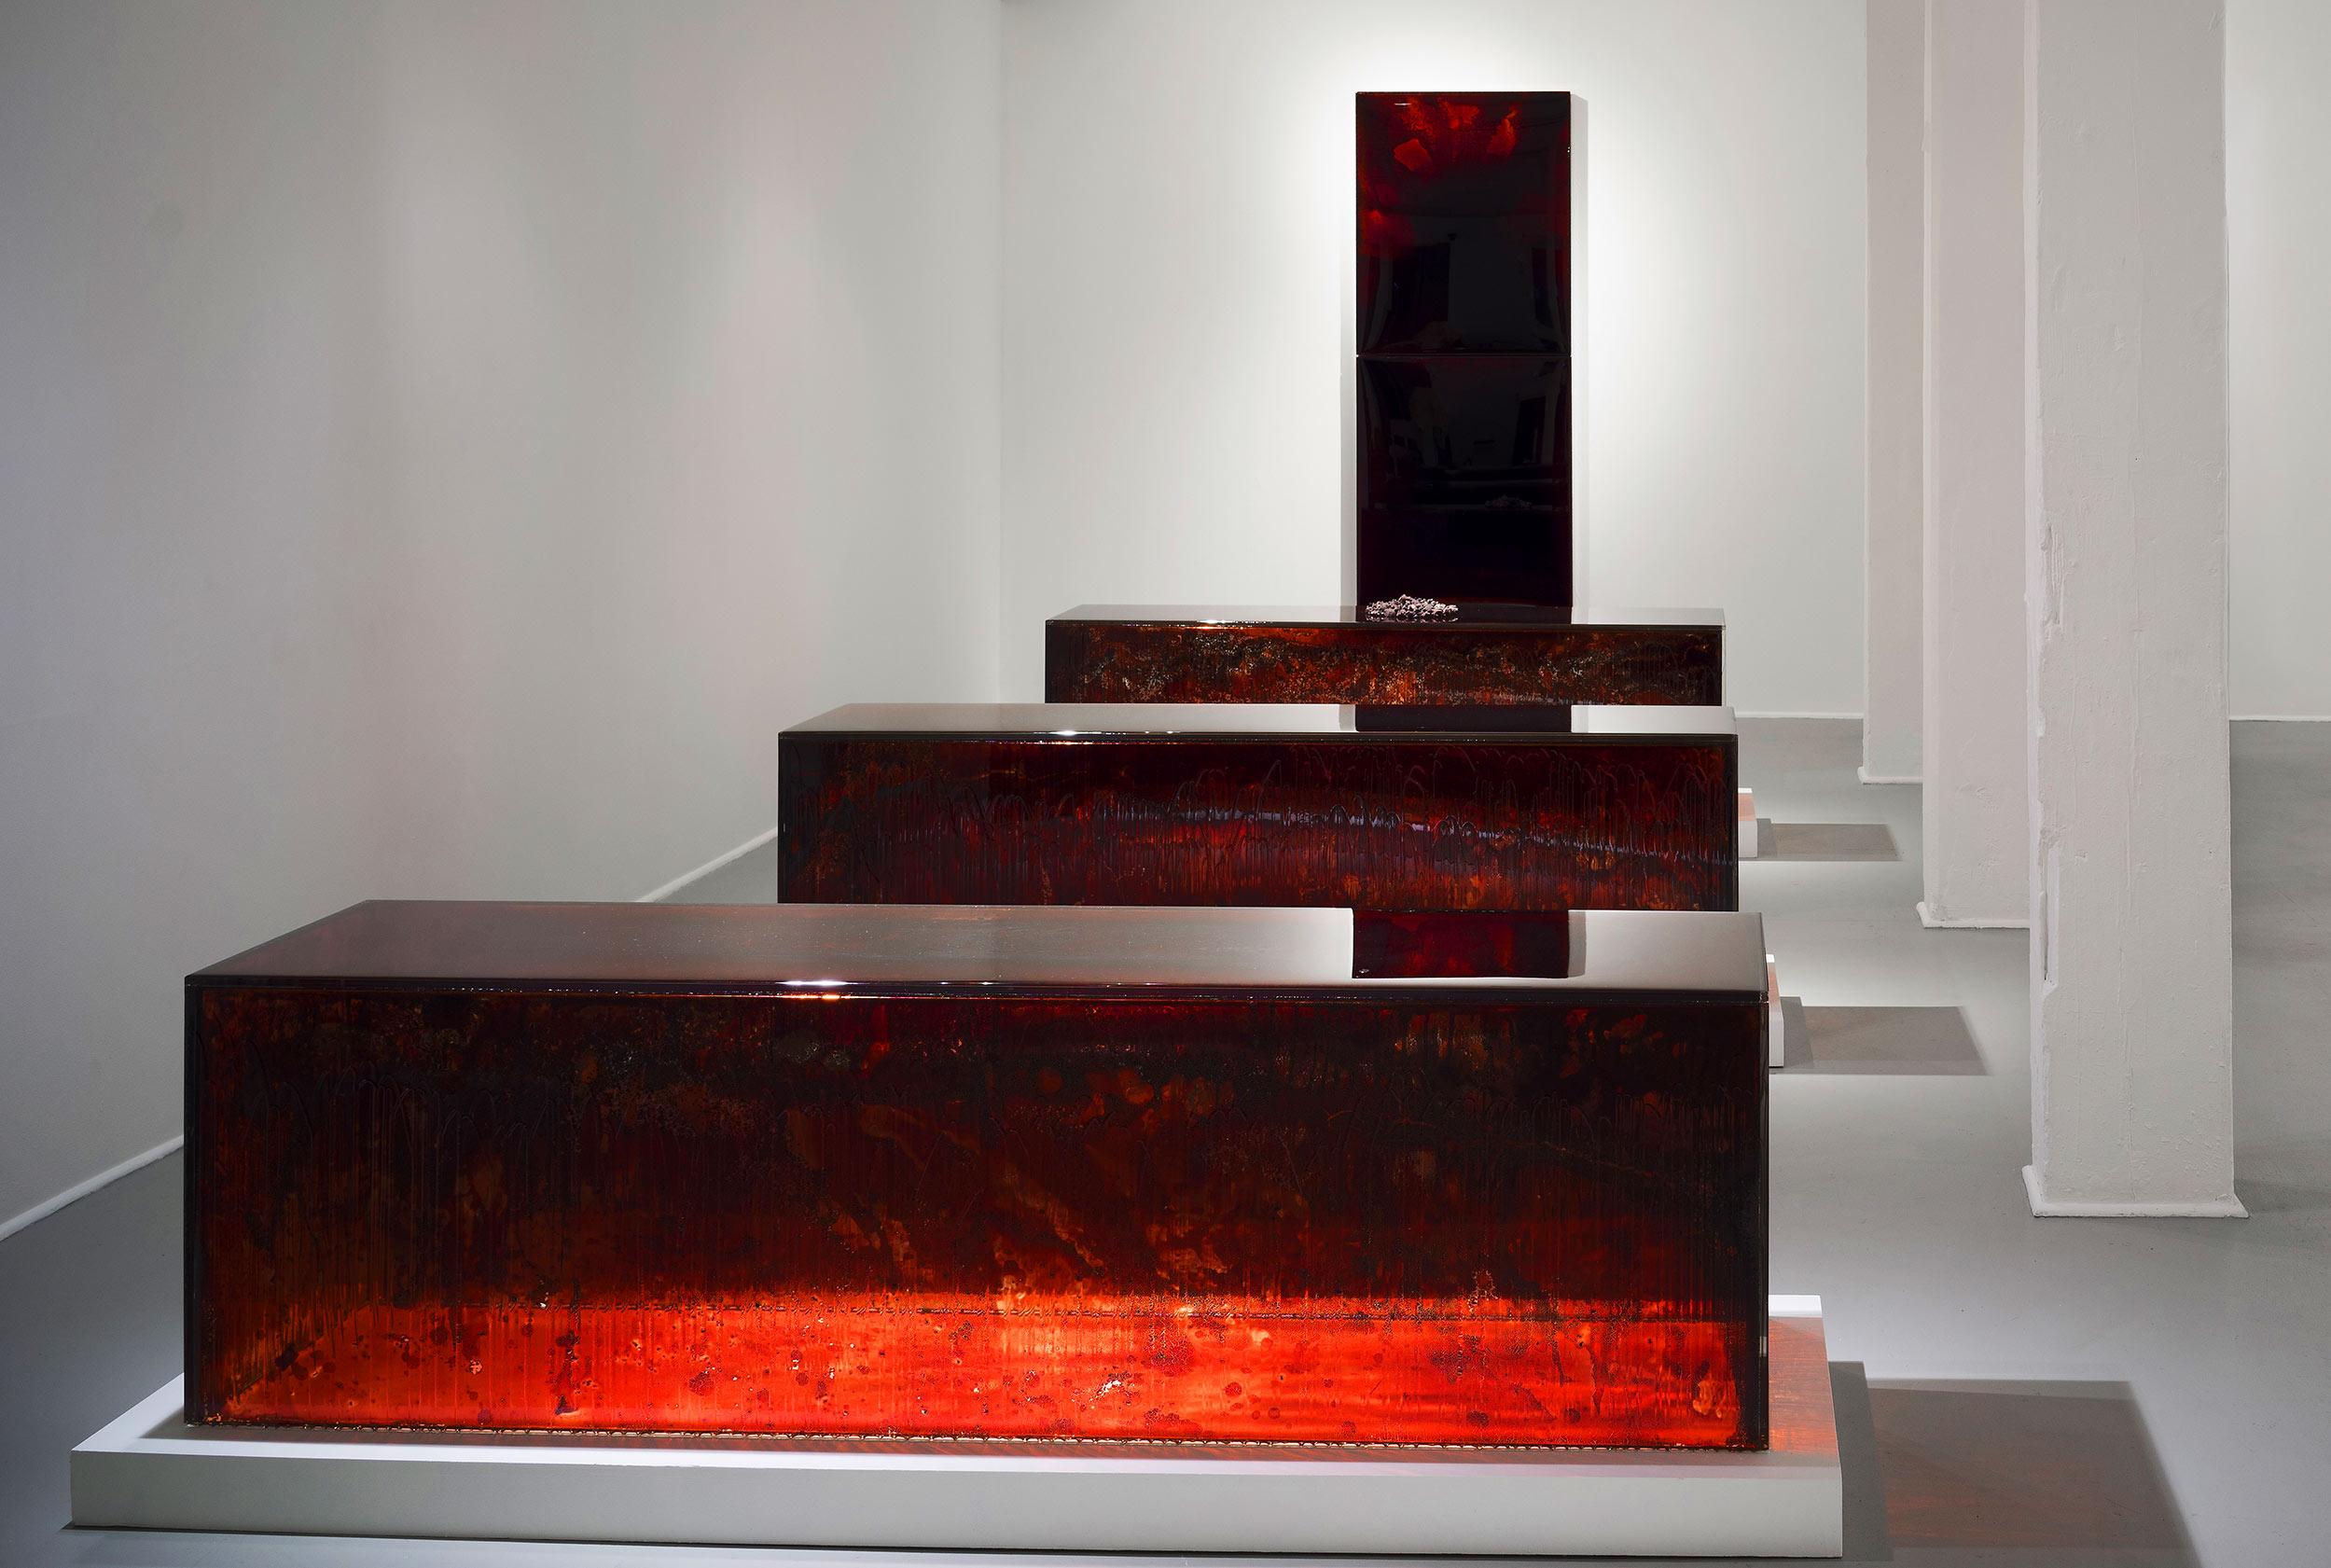 Installation View, Boston Center for the Arts (2014)